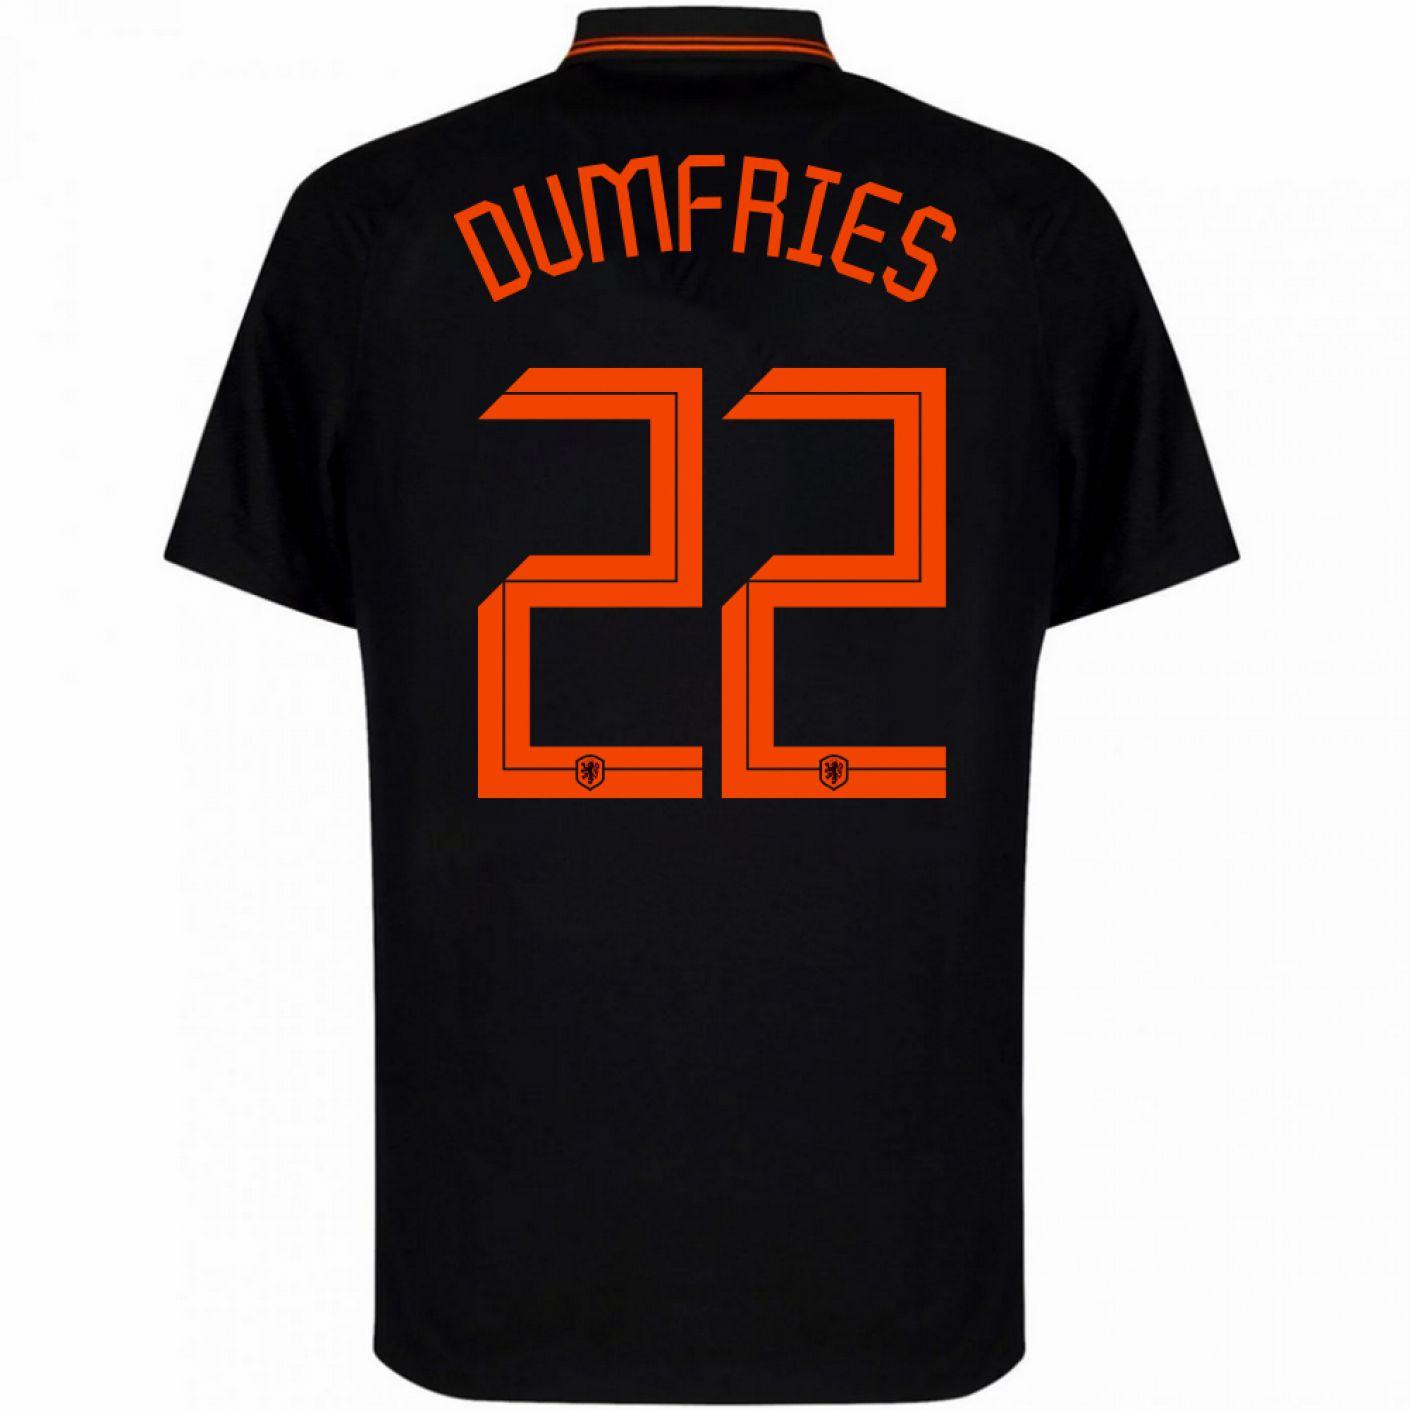 Nike Dumfries 22 Nederland Uitshirt 2020-2022